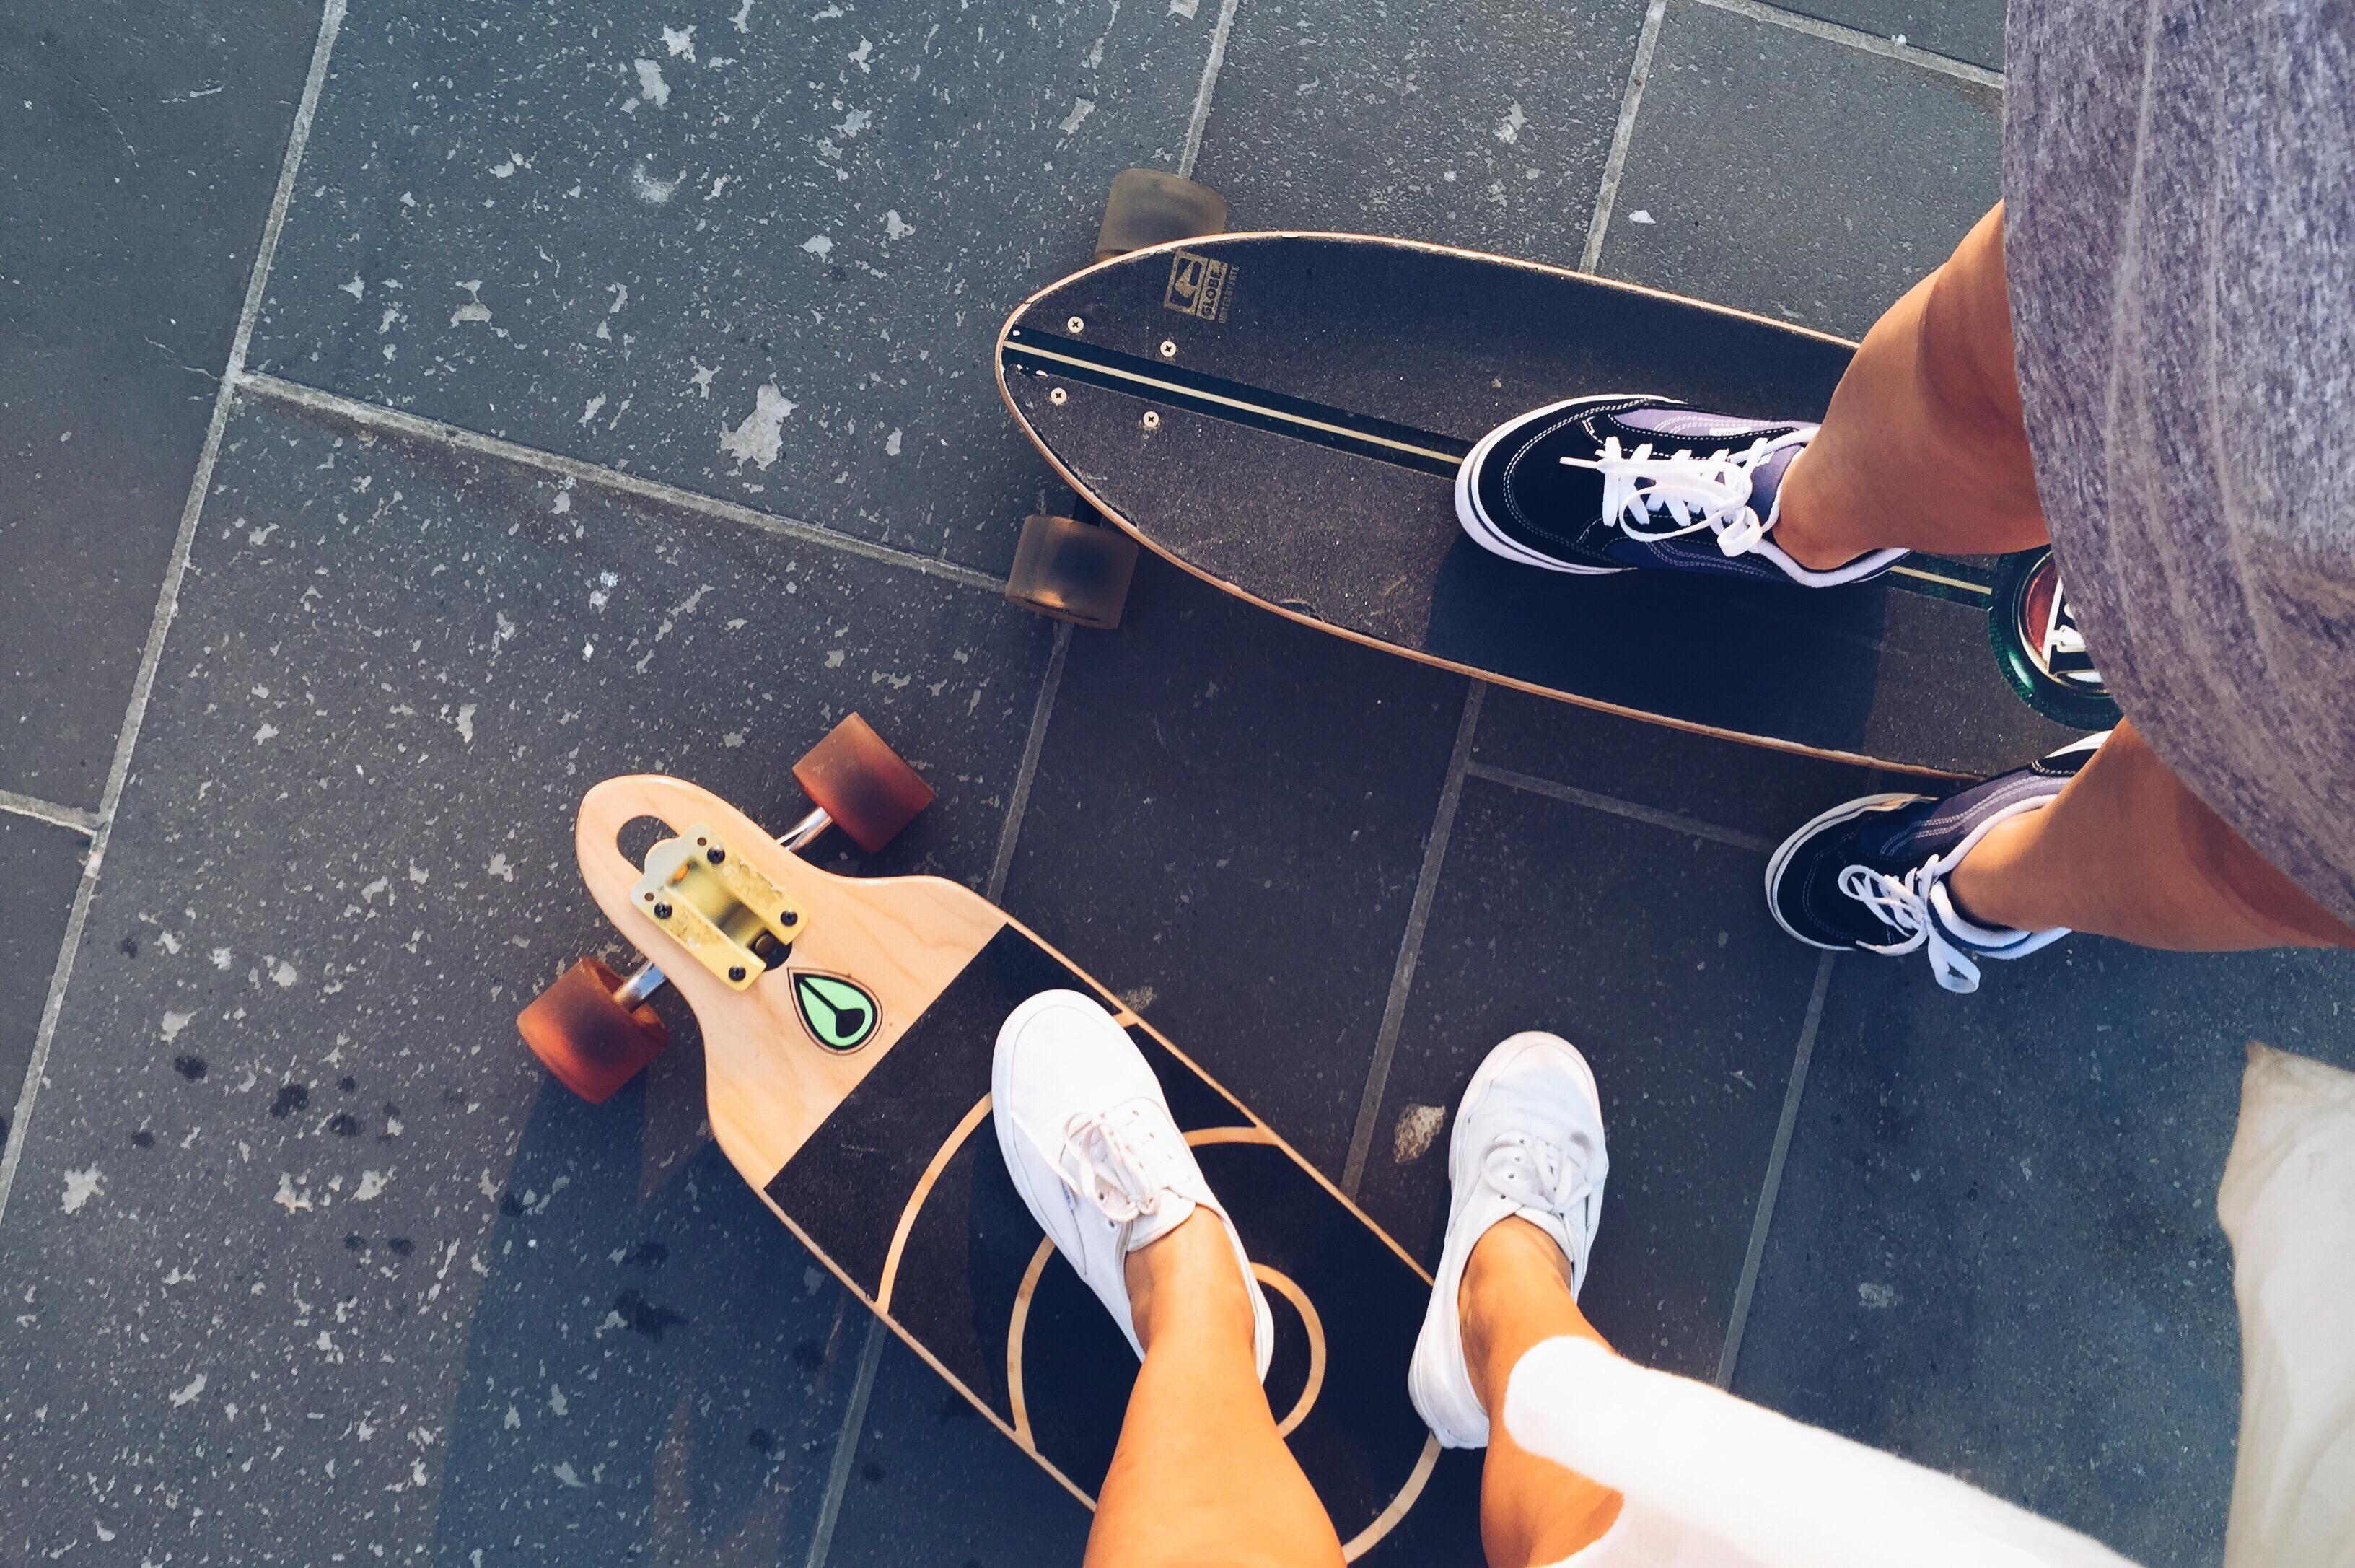 Den Haag Tipps: Longboarden & Skaten in Scheveningen